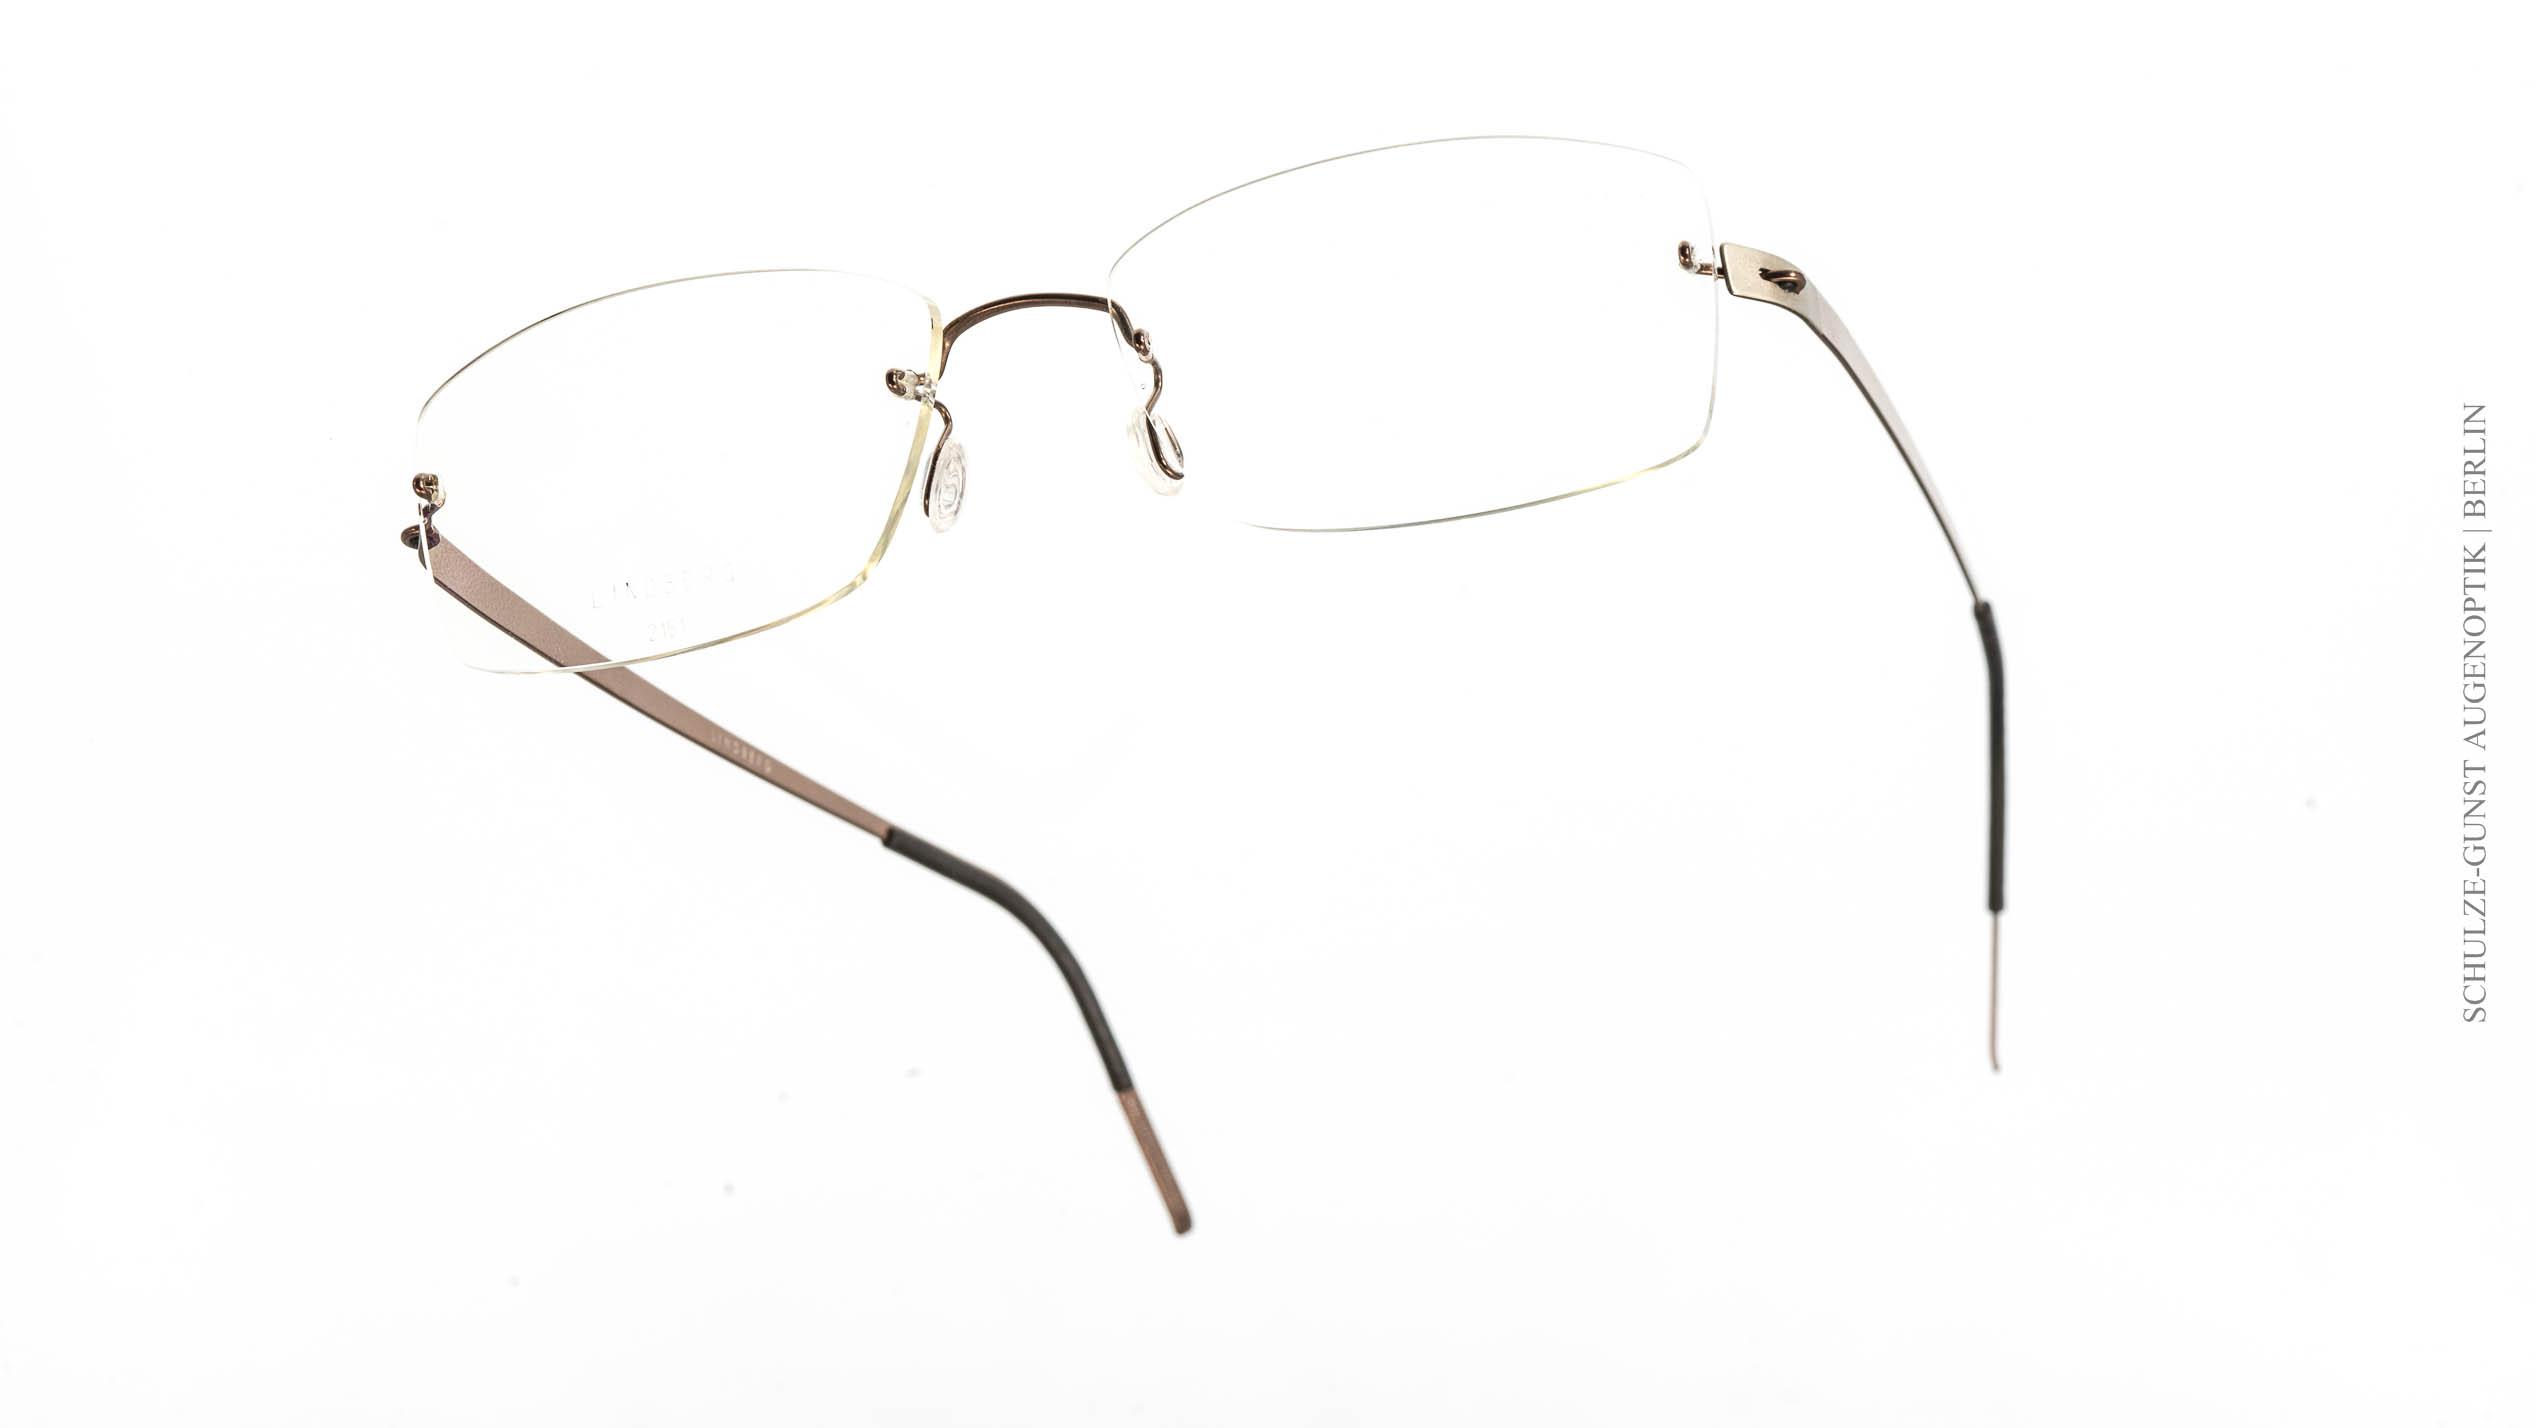 43c587afb42 lindberg-damenbrille Archive - SCHULZE-GUNST Augenoptik seit 1894